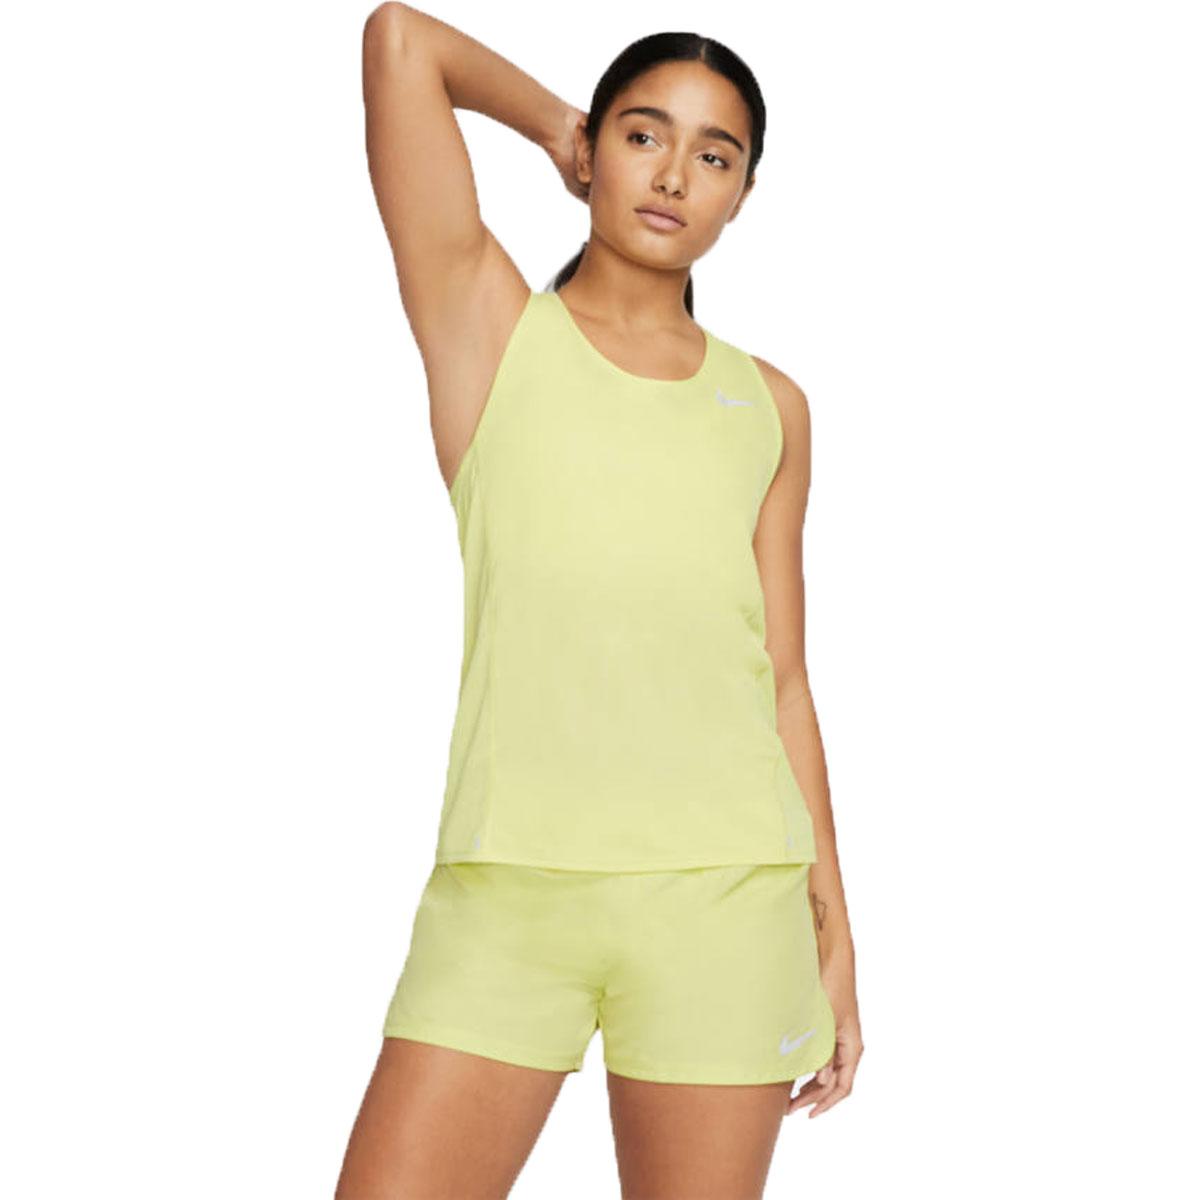 Women's Nike City Sleek Tank - Color: Limelight/Reflective - Size: S, Limelight/Reflective, large, image 1